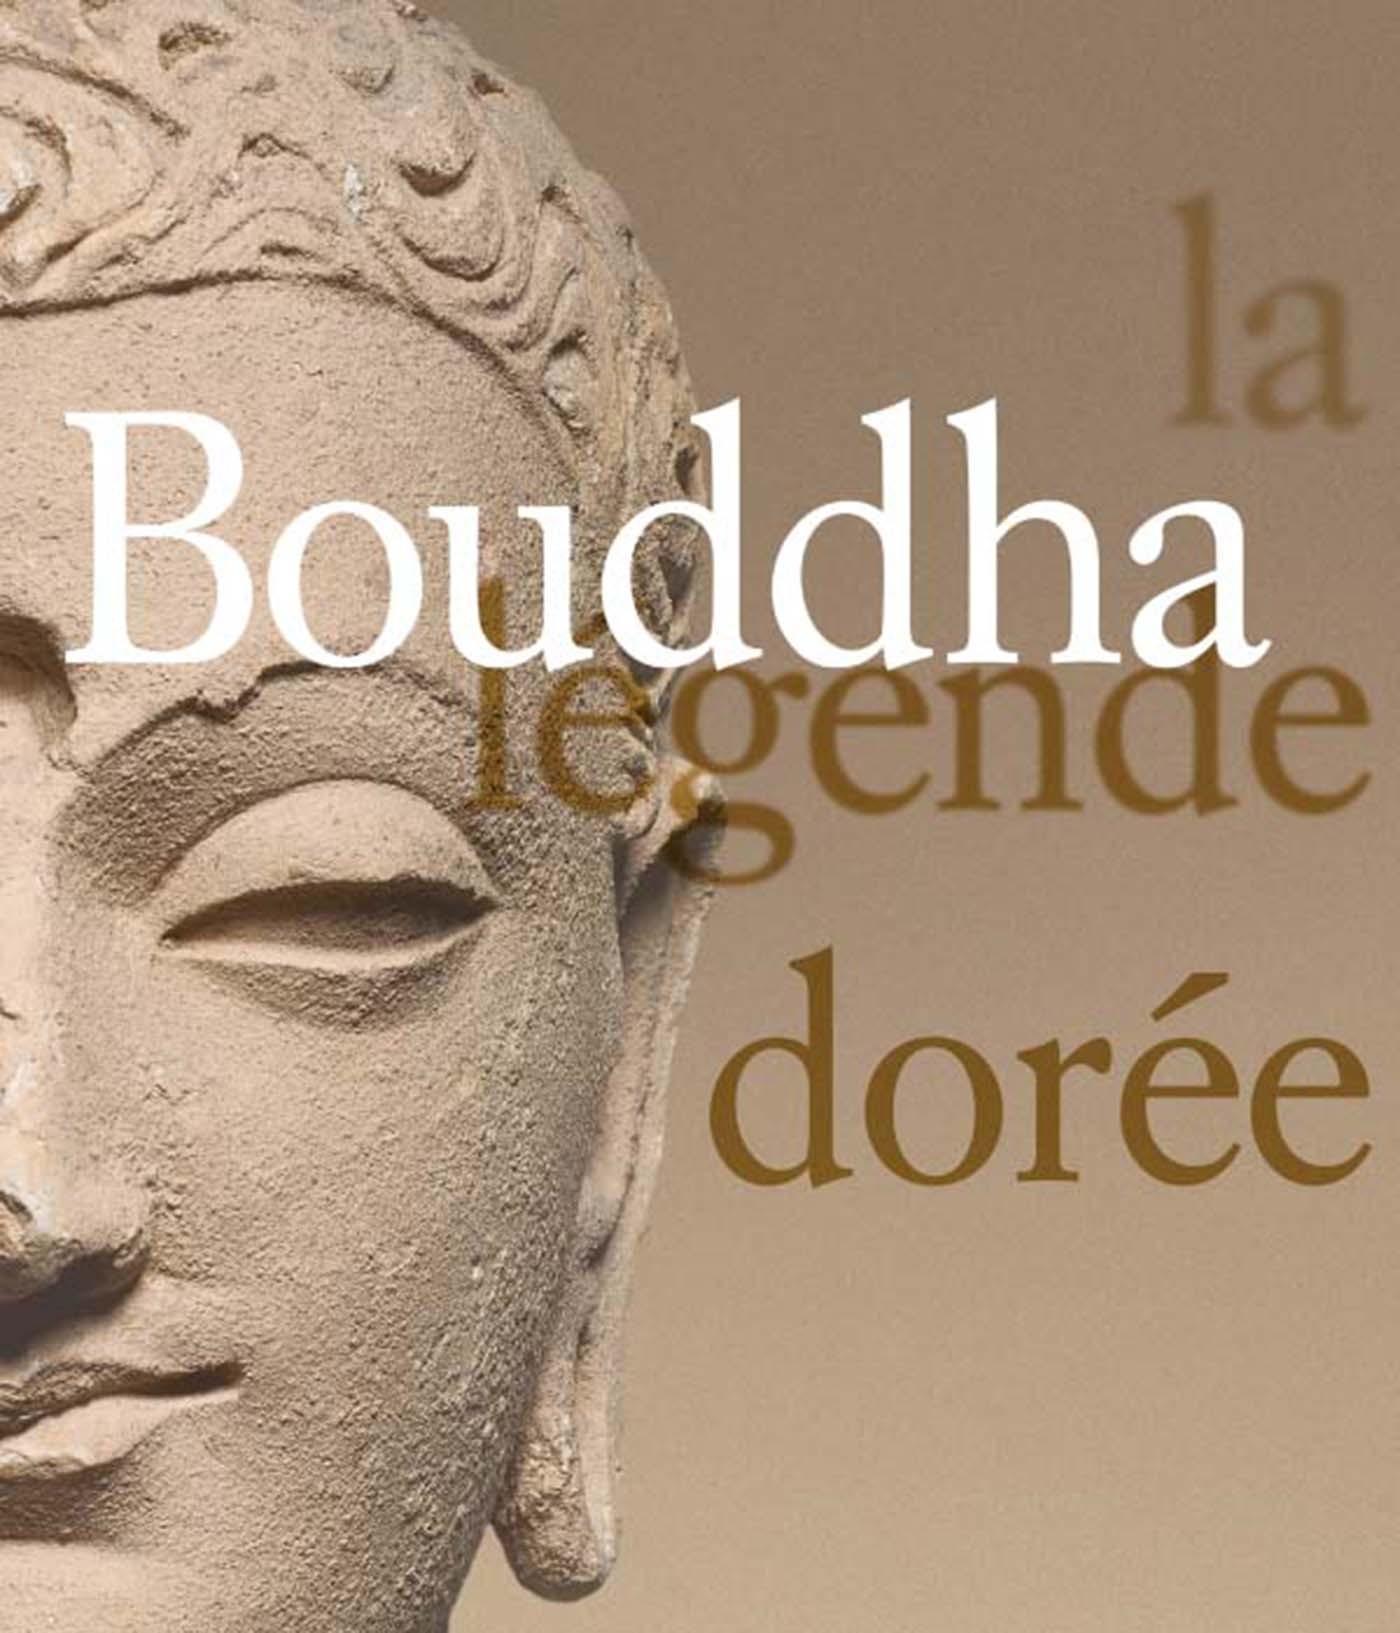 BOUDDHA, LA LEGENDE DOREE